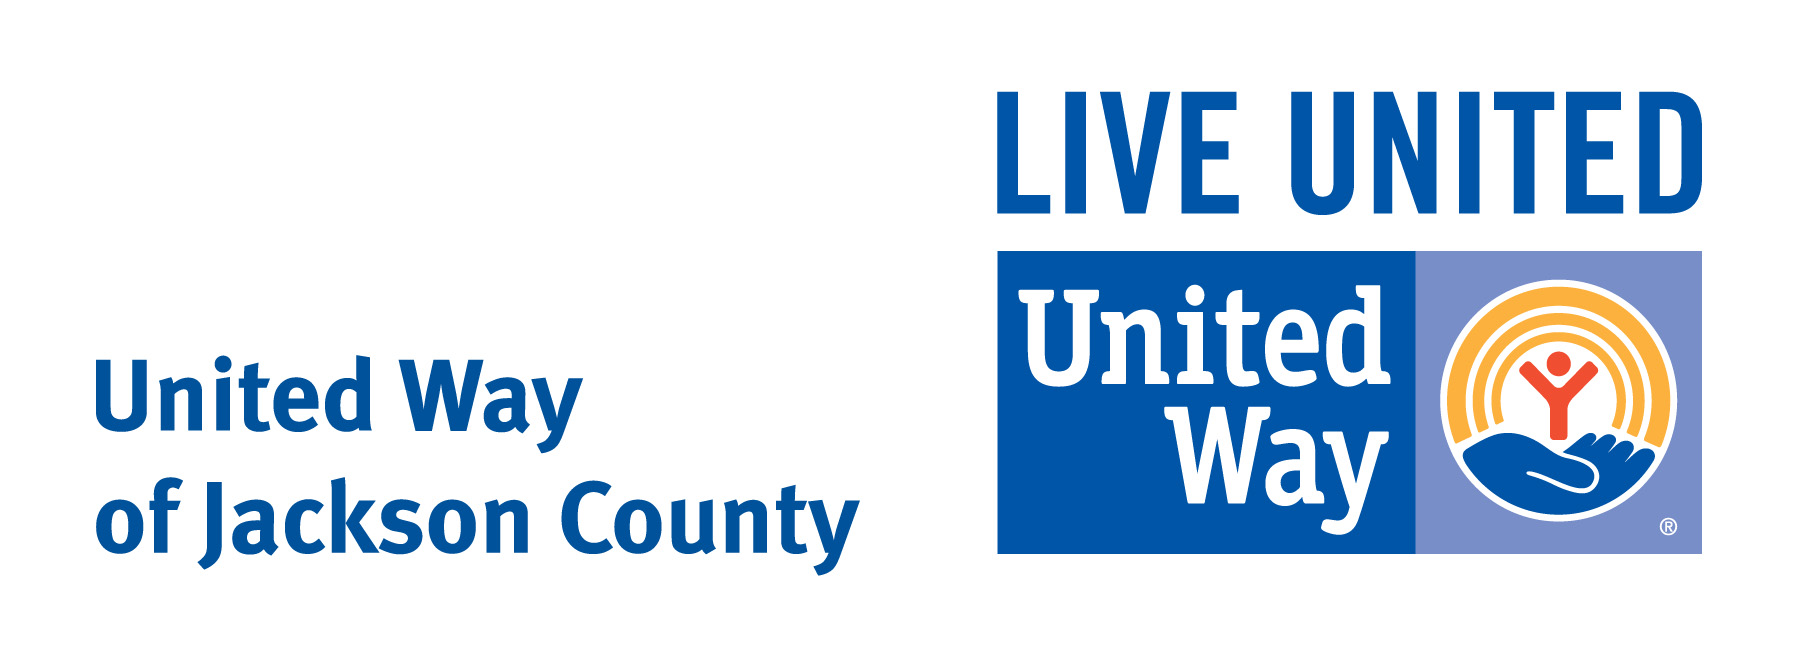 United Way Fire Fund Jackson County logo